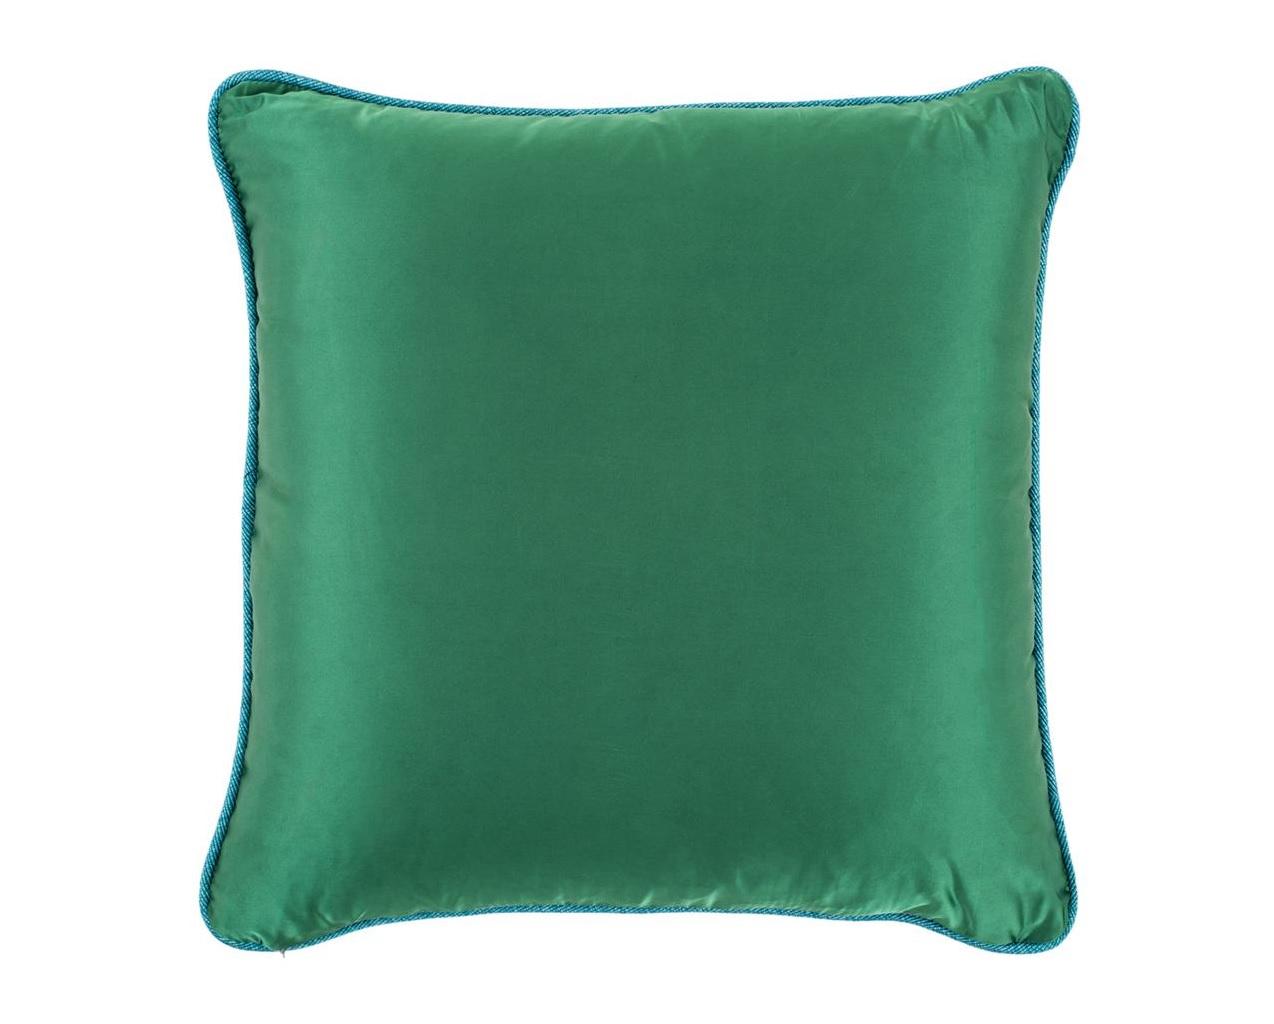 Подушка AlbinКвадратные подушки и наволочки<br><br><br>Material: Текстиль<br>Width см: 60<br>Height см: 60